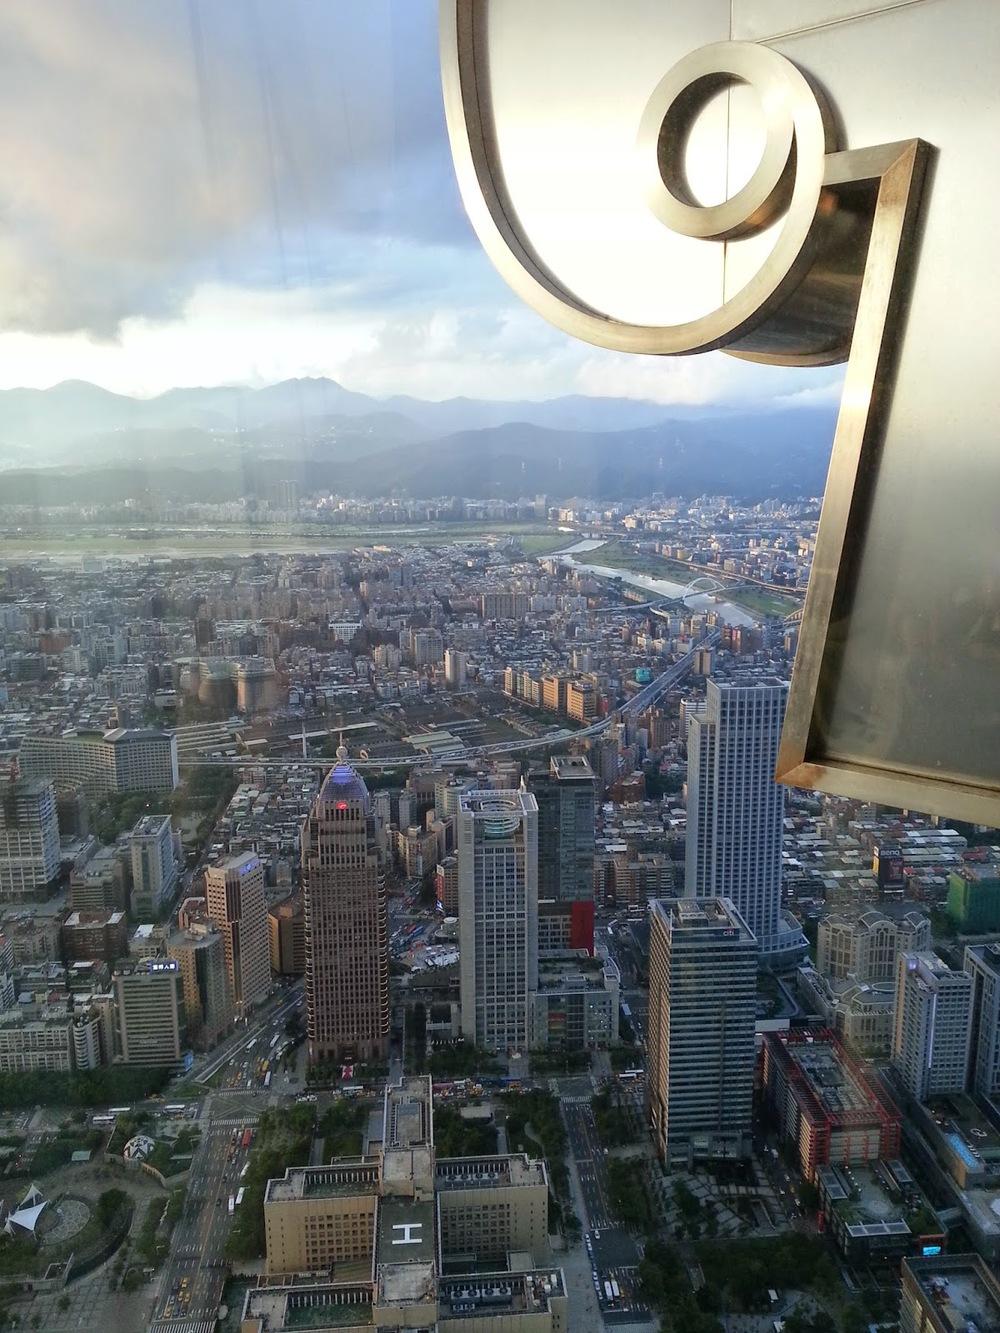 Taiwan%2BTaipei%2B101%2BSkycraper%2BTop.jpg